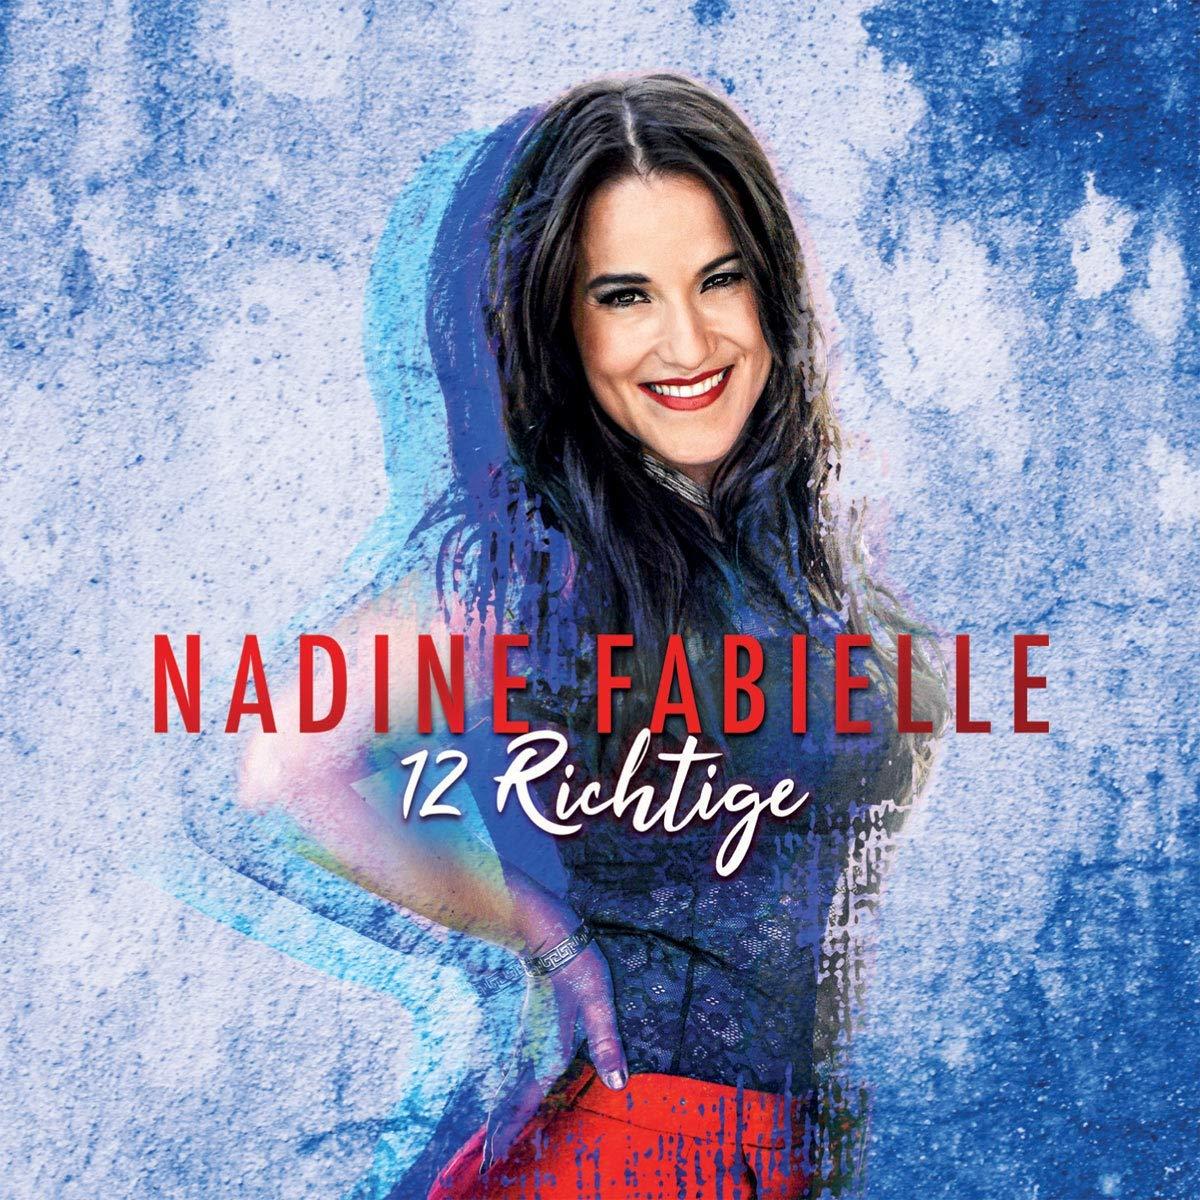 NADINE FABIELLE * 12 Richtige (CD)